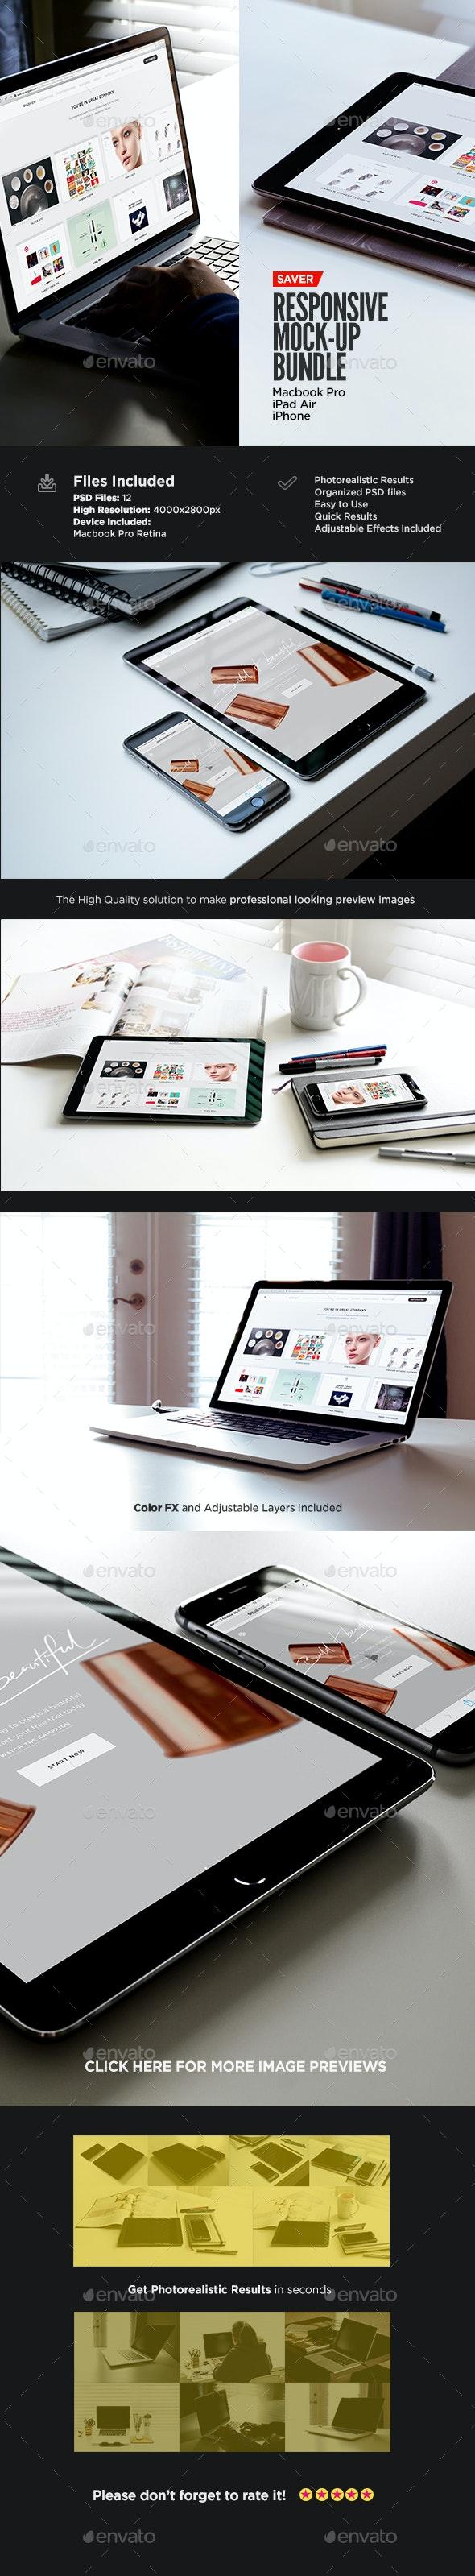 Responsive Screen MockUp Pack | Bundle Edition - Multiple Displays